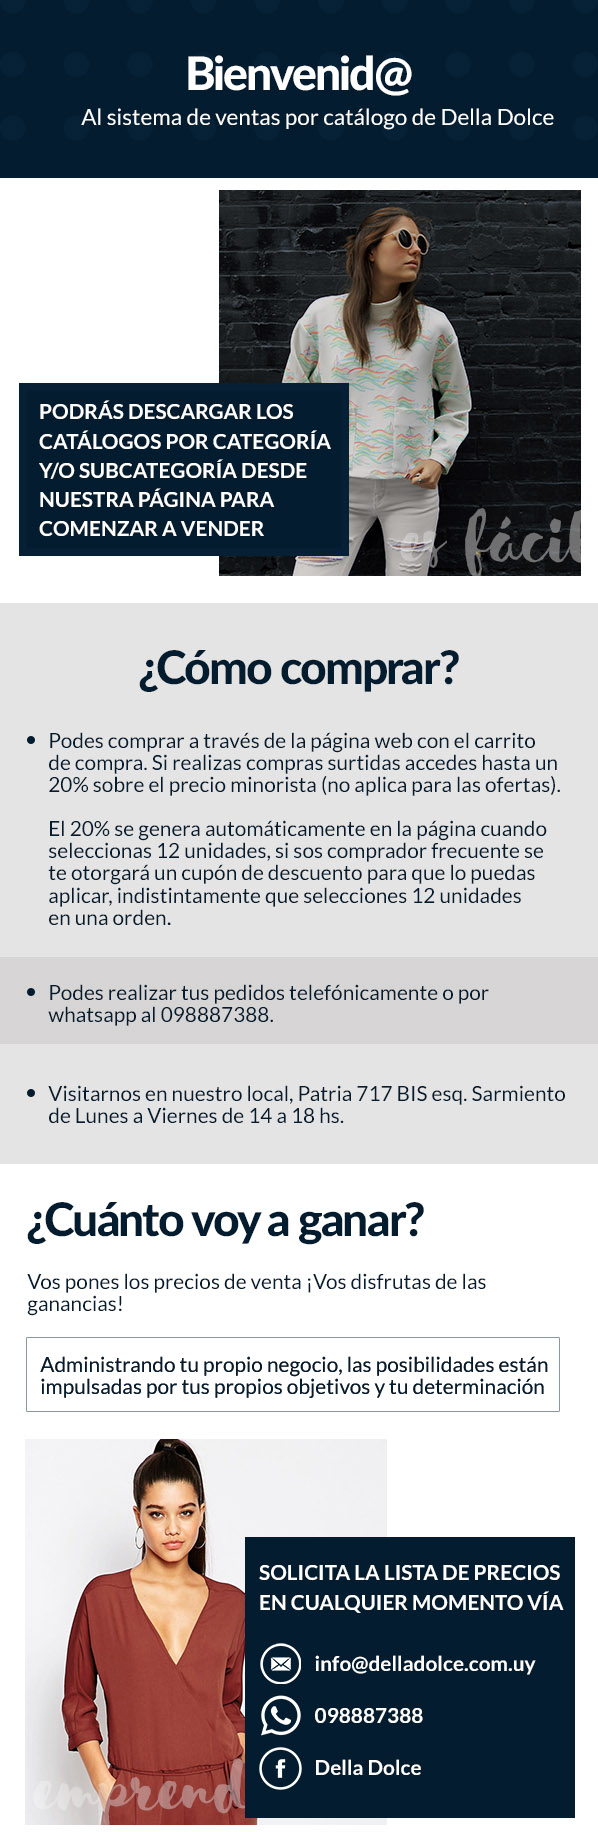 EMAIL VENTAS POR CATALOGO DELLA DOLCE 95cac938d60f